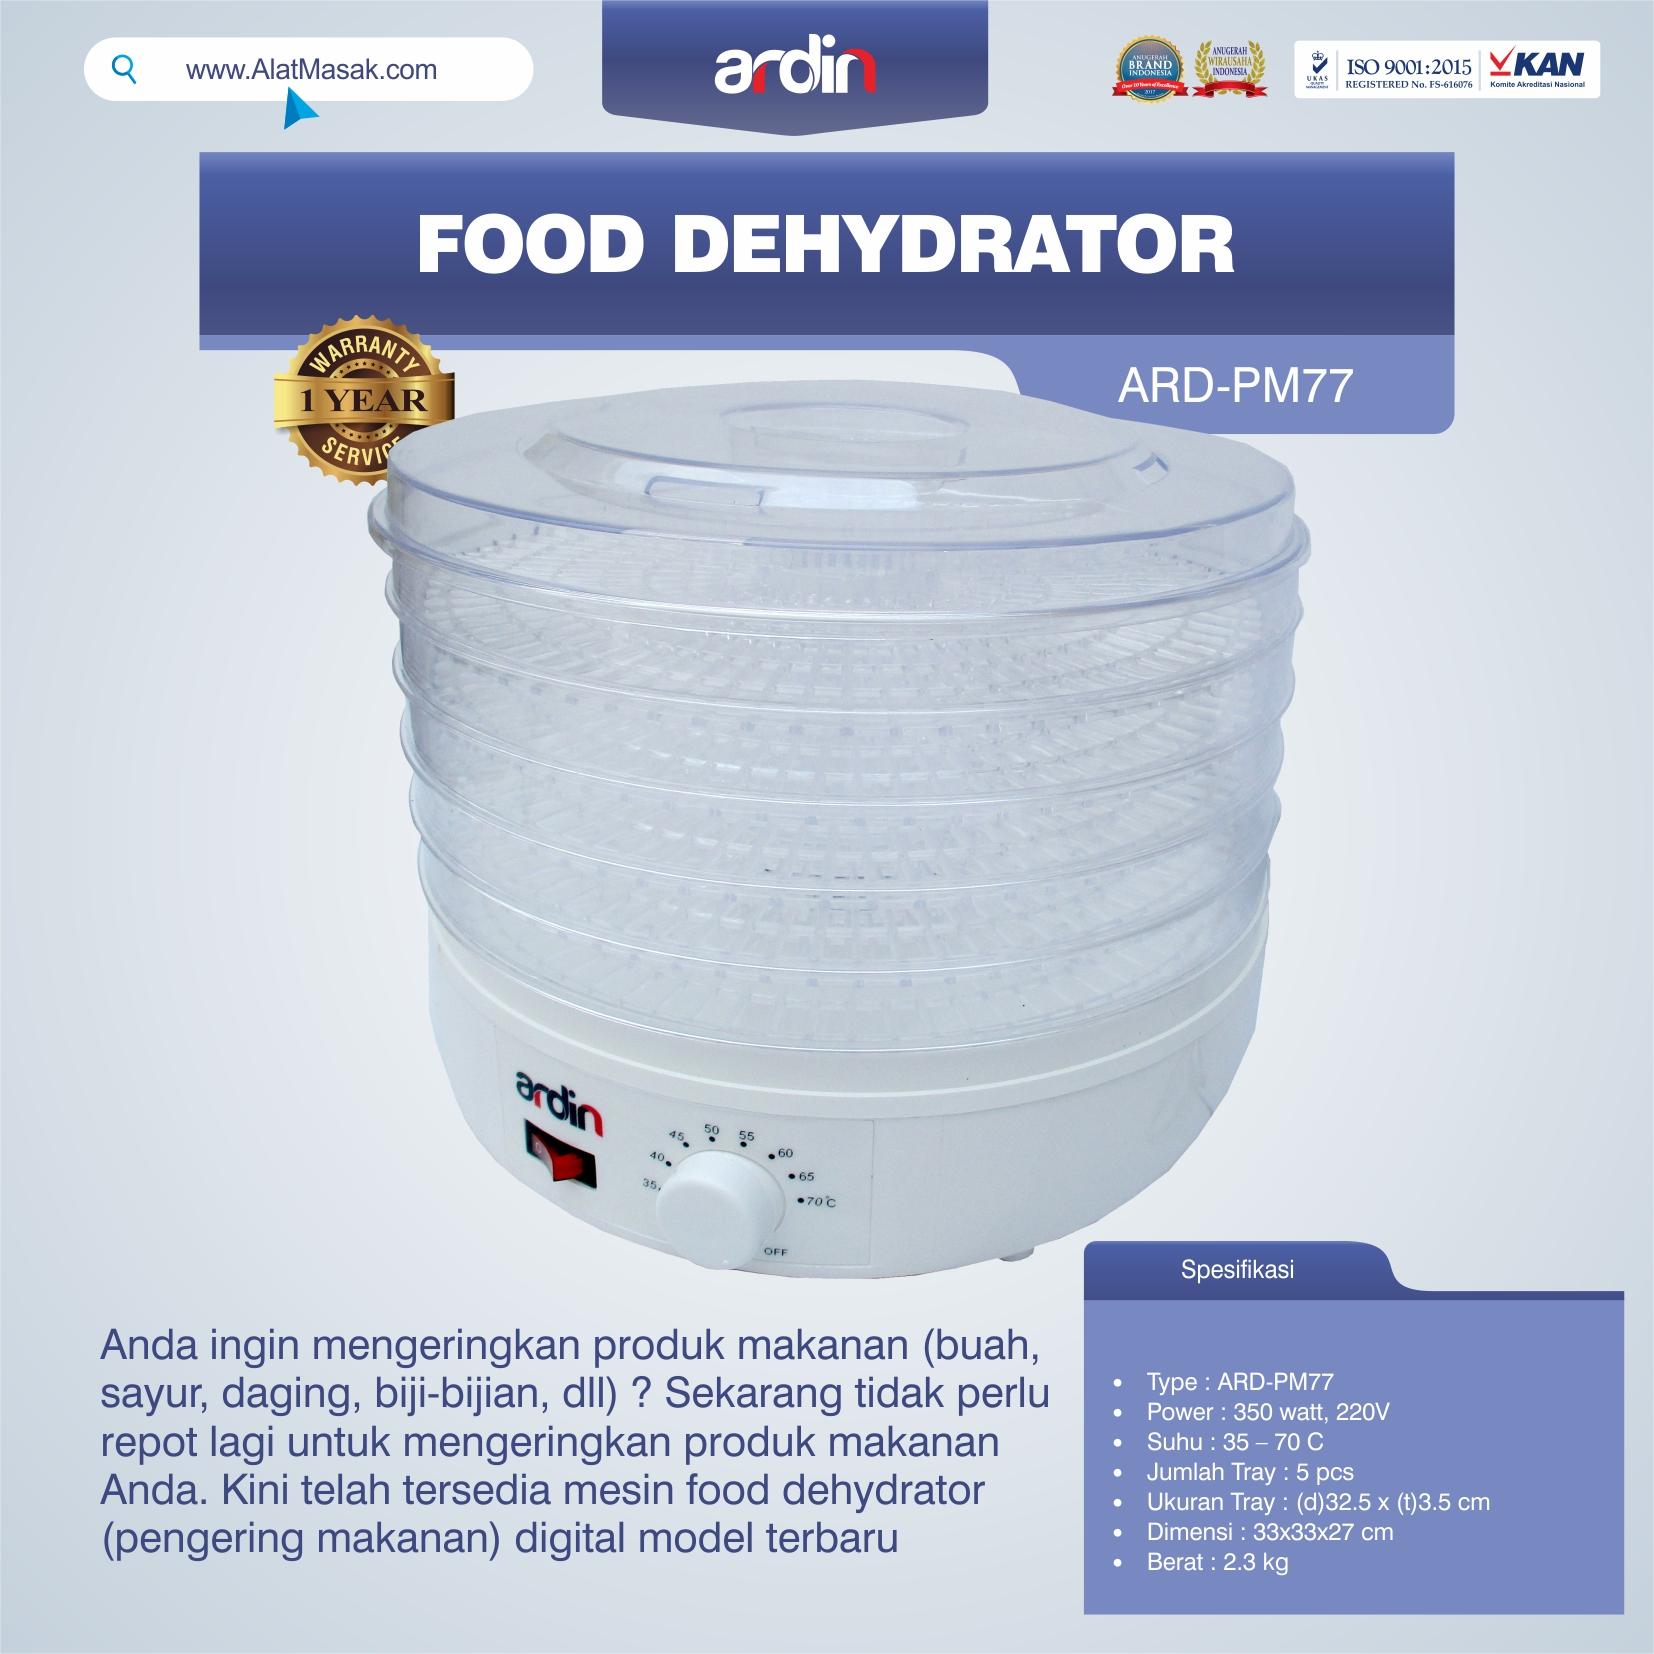 Jual Food Dehydrator ARD-PM77 di Mataram